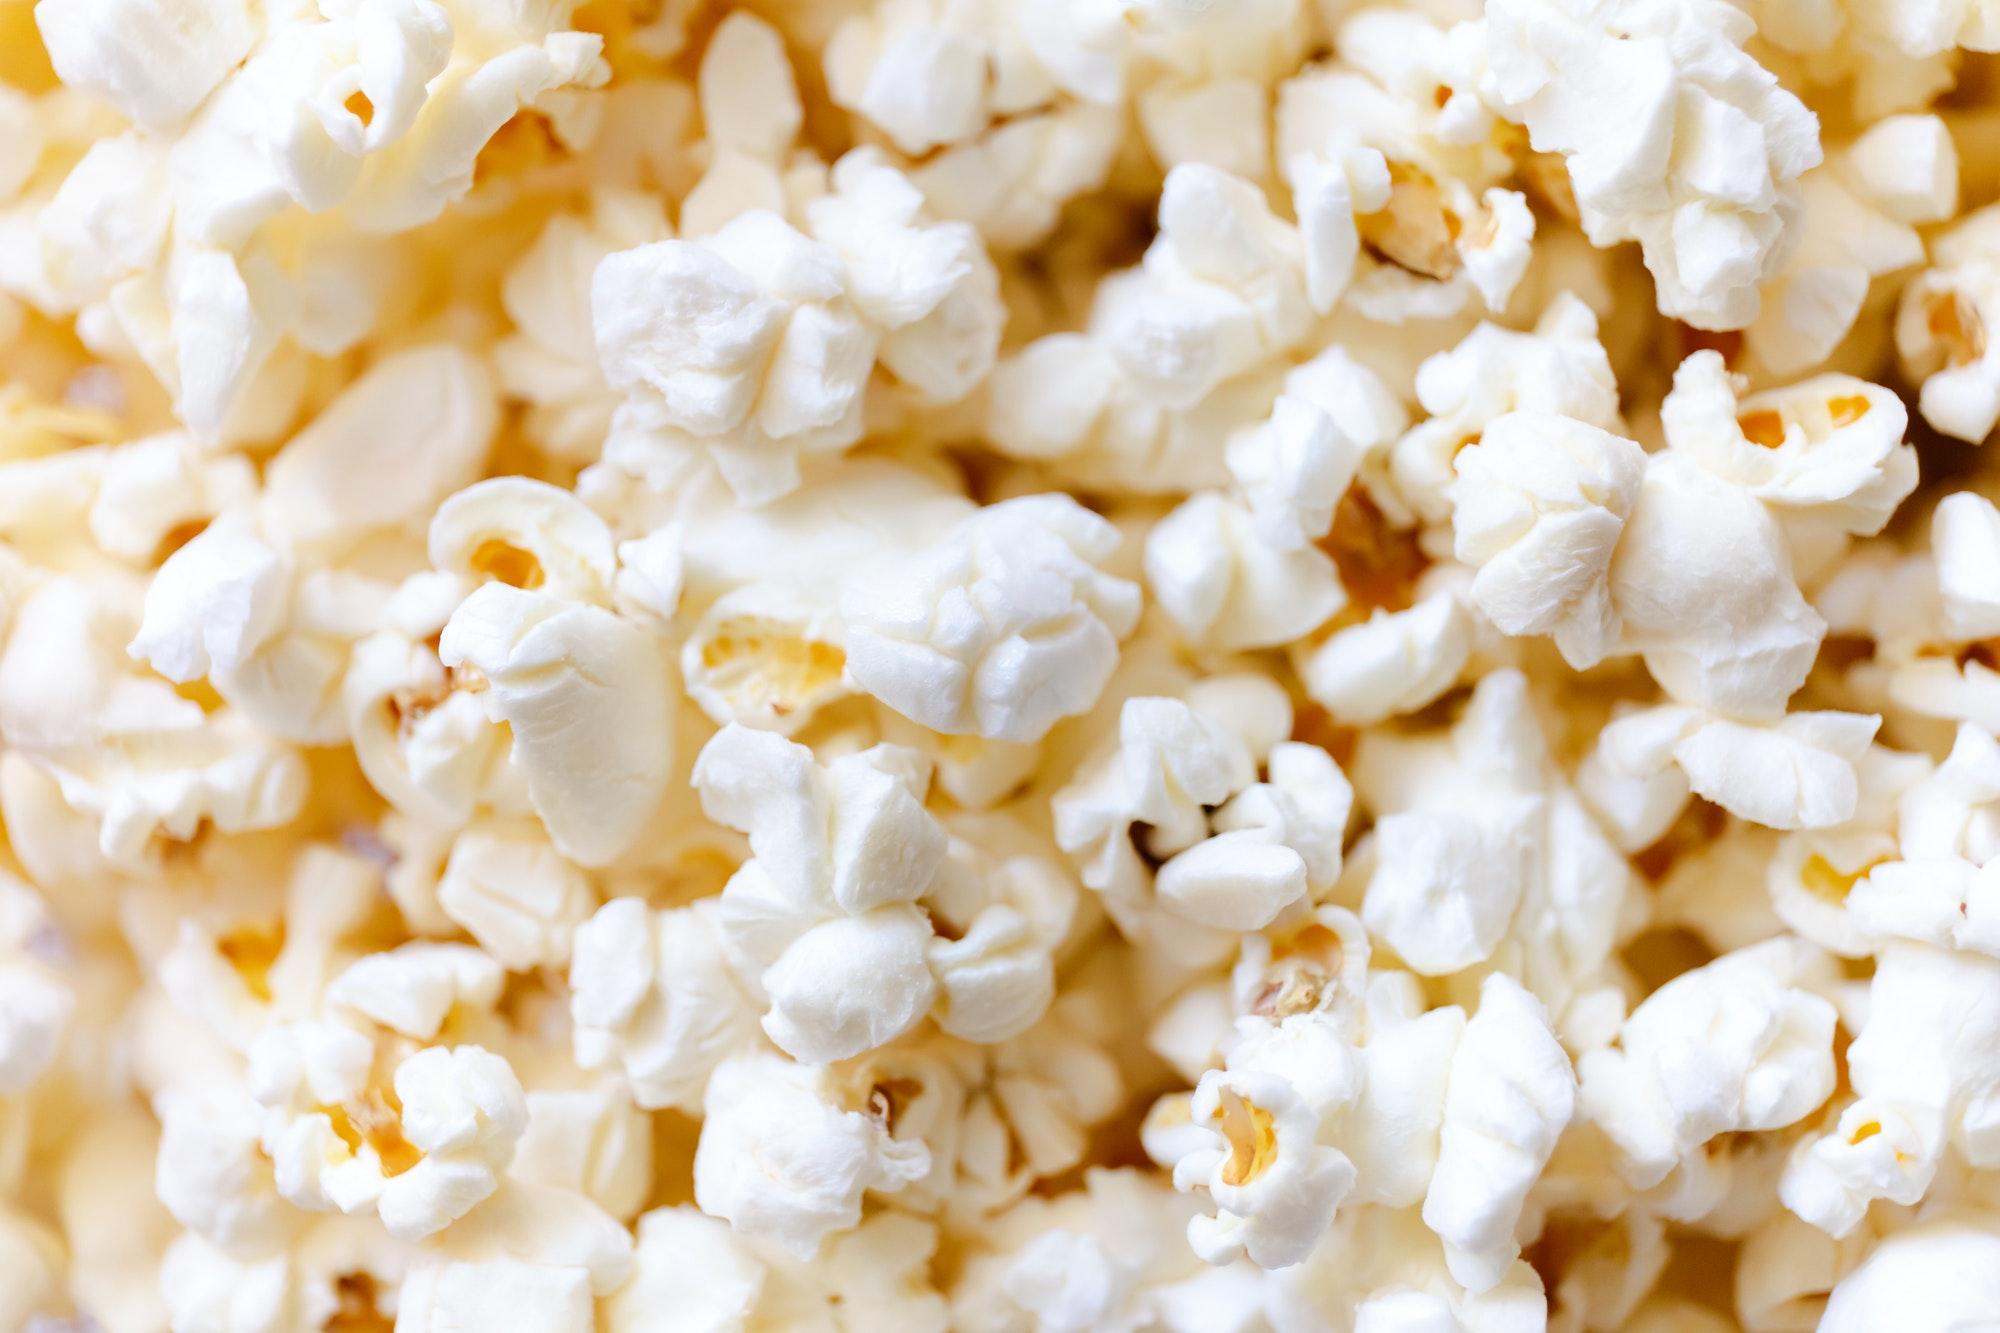 Popcorn background, macro shot